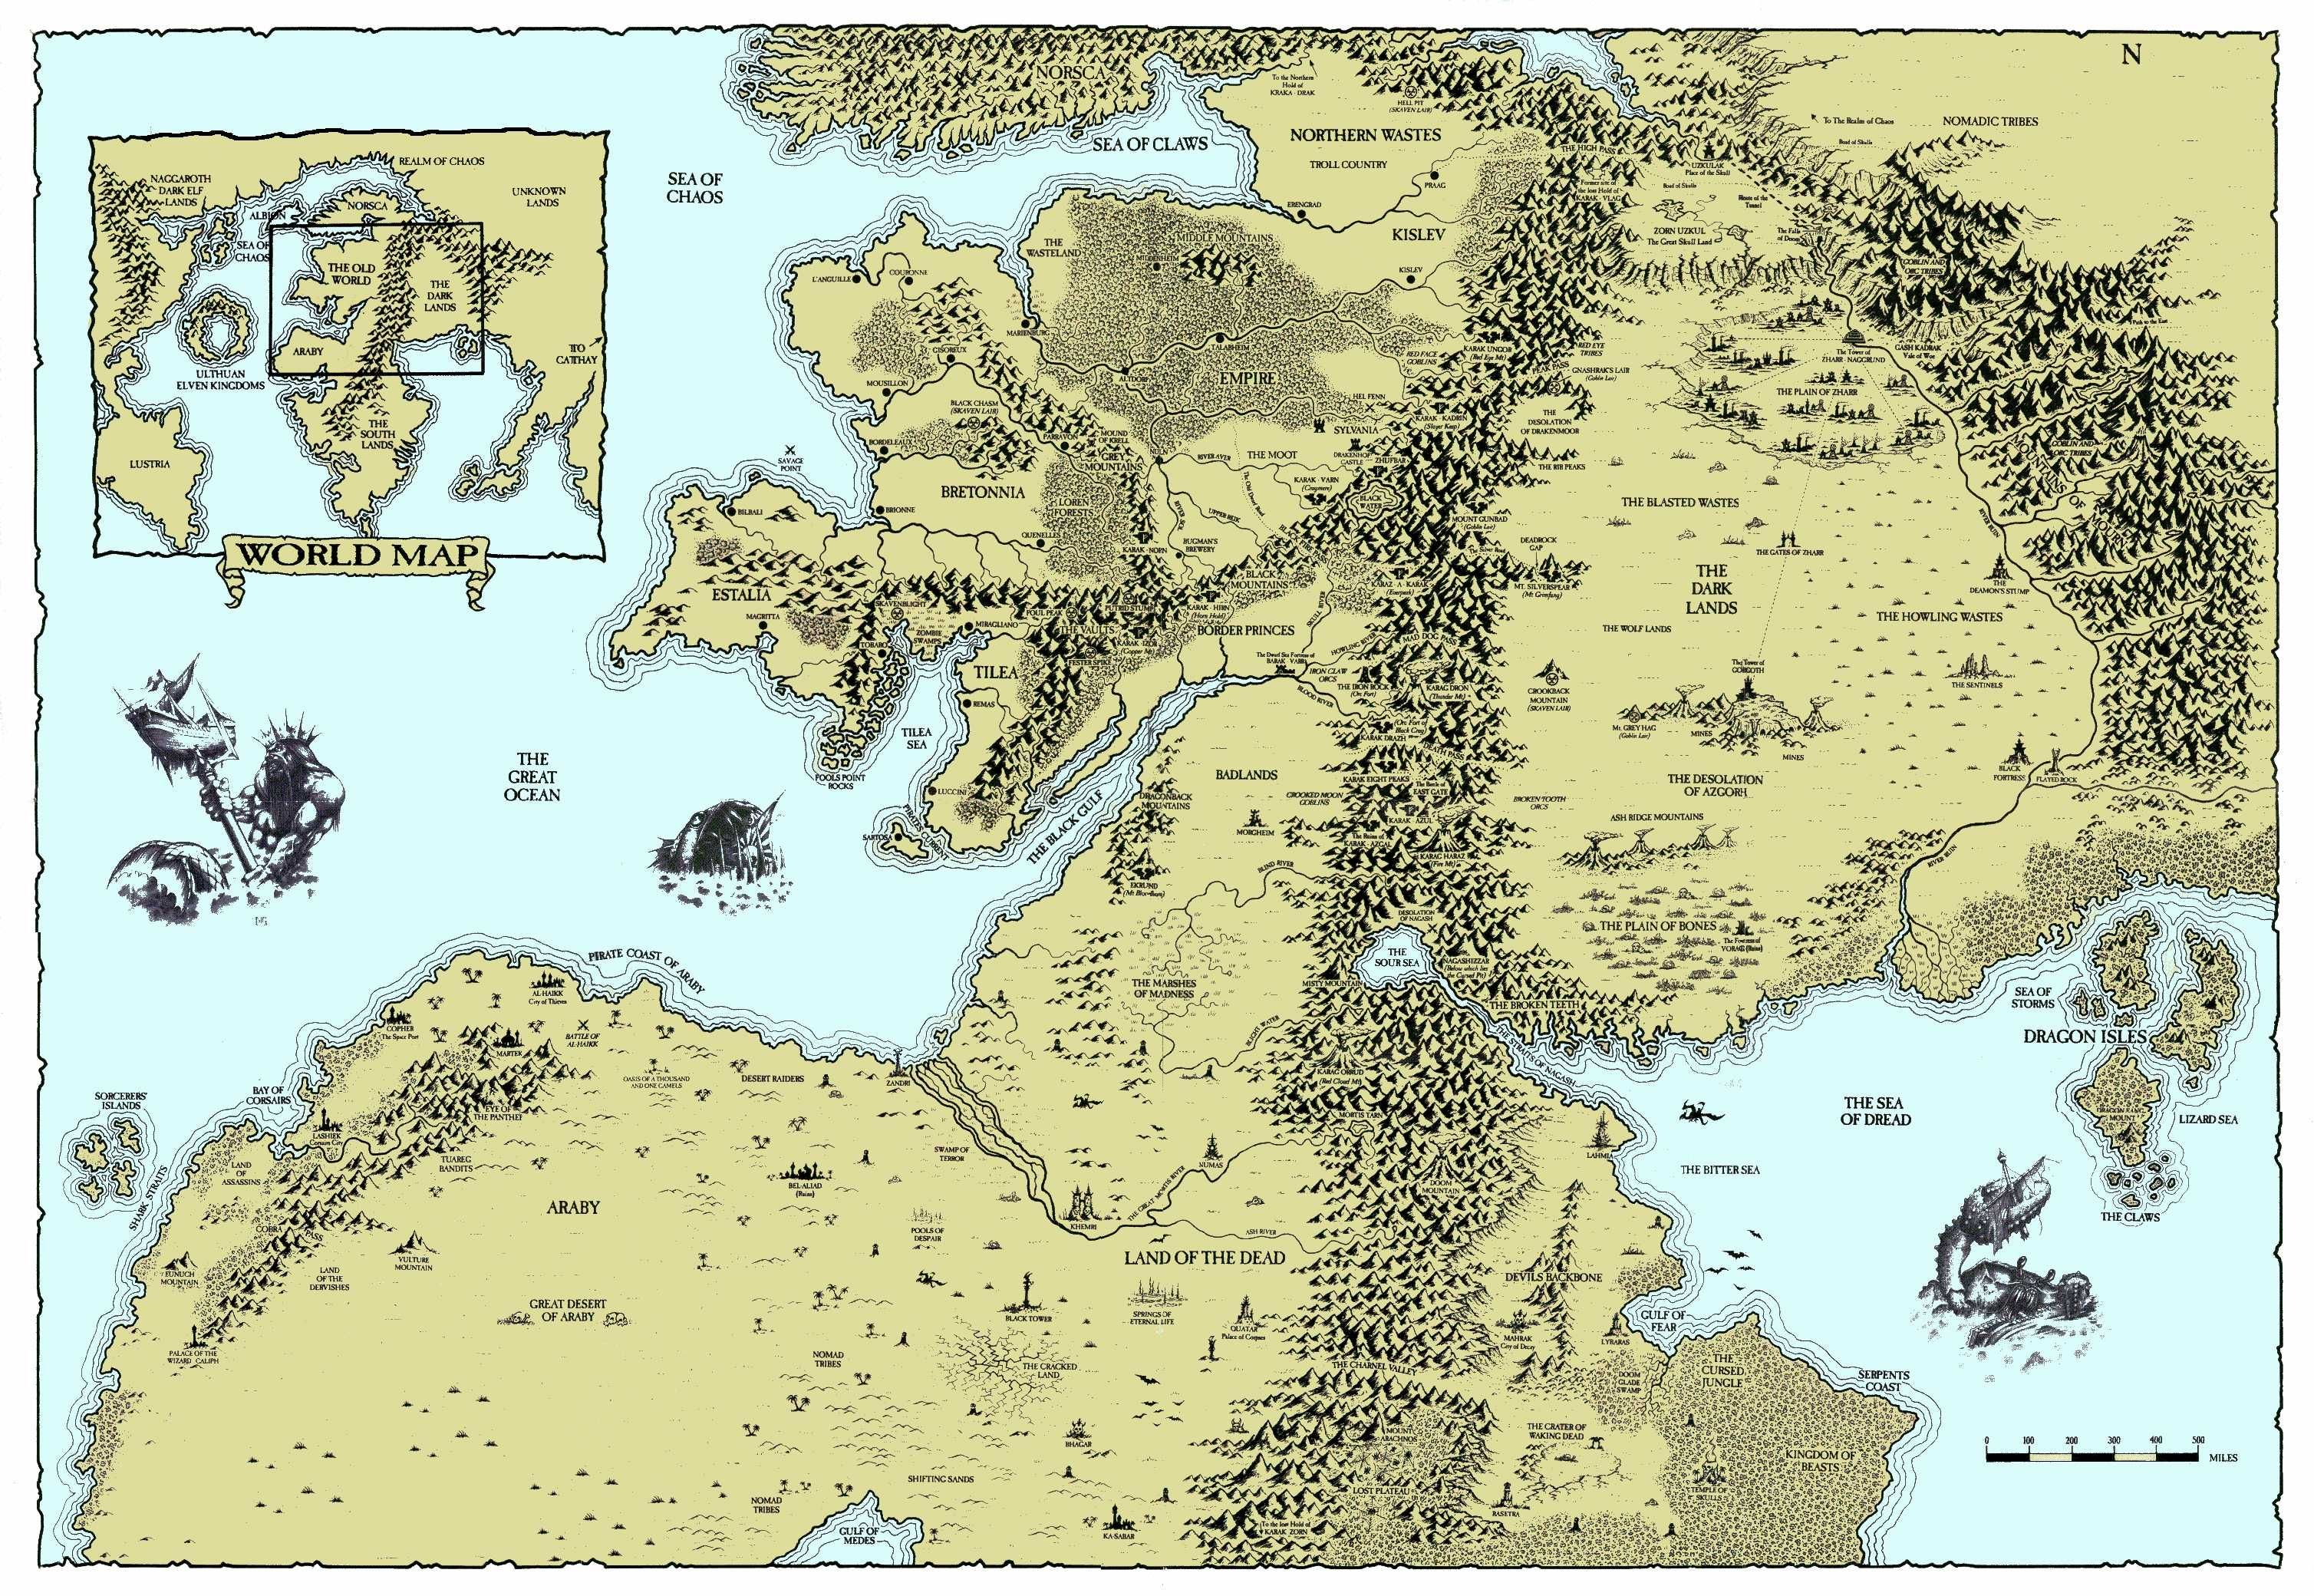 Fantasy maps mega dump in 2019 | World Maps | Pinterest | Fantasy